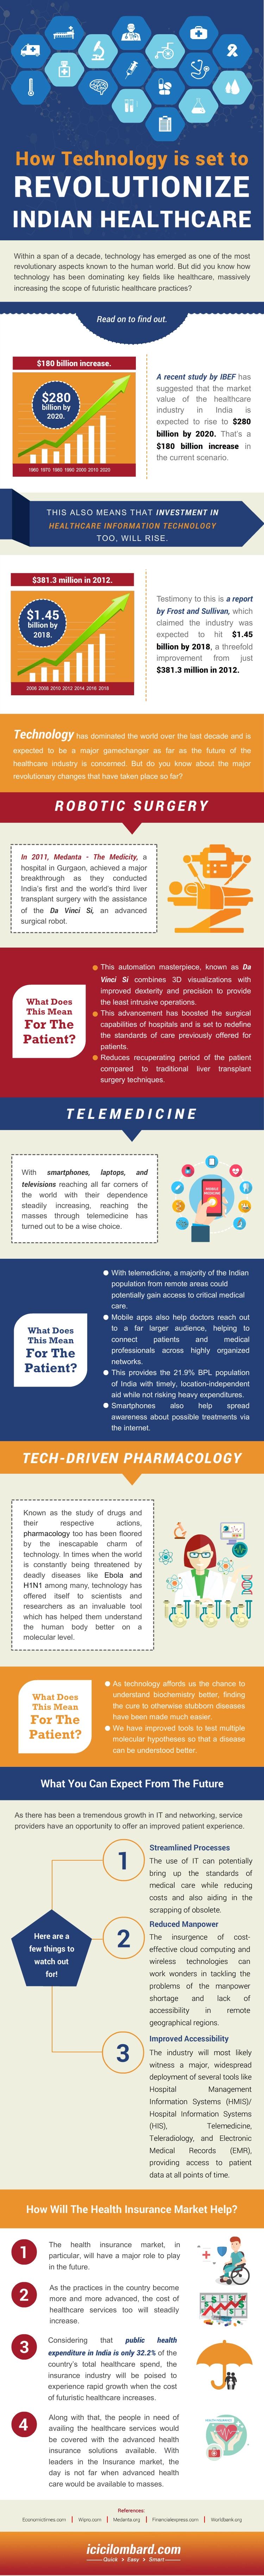 20151223-technology-revolutionize-indian-healthcare_v3